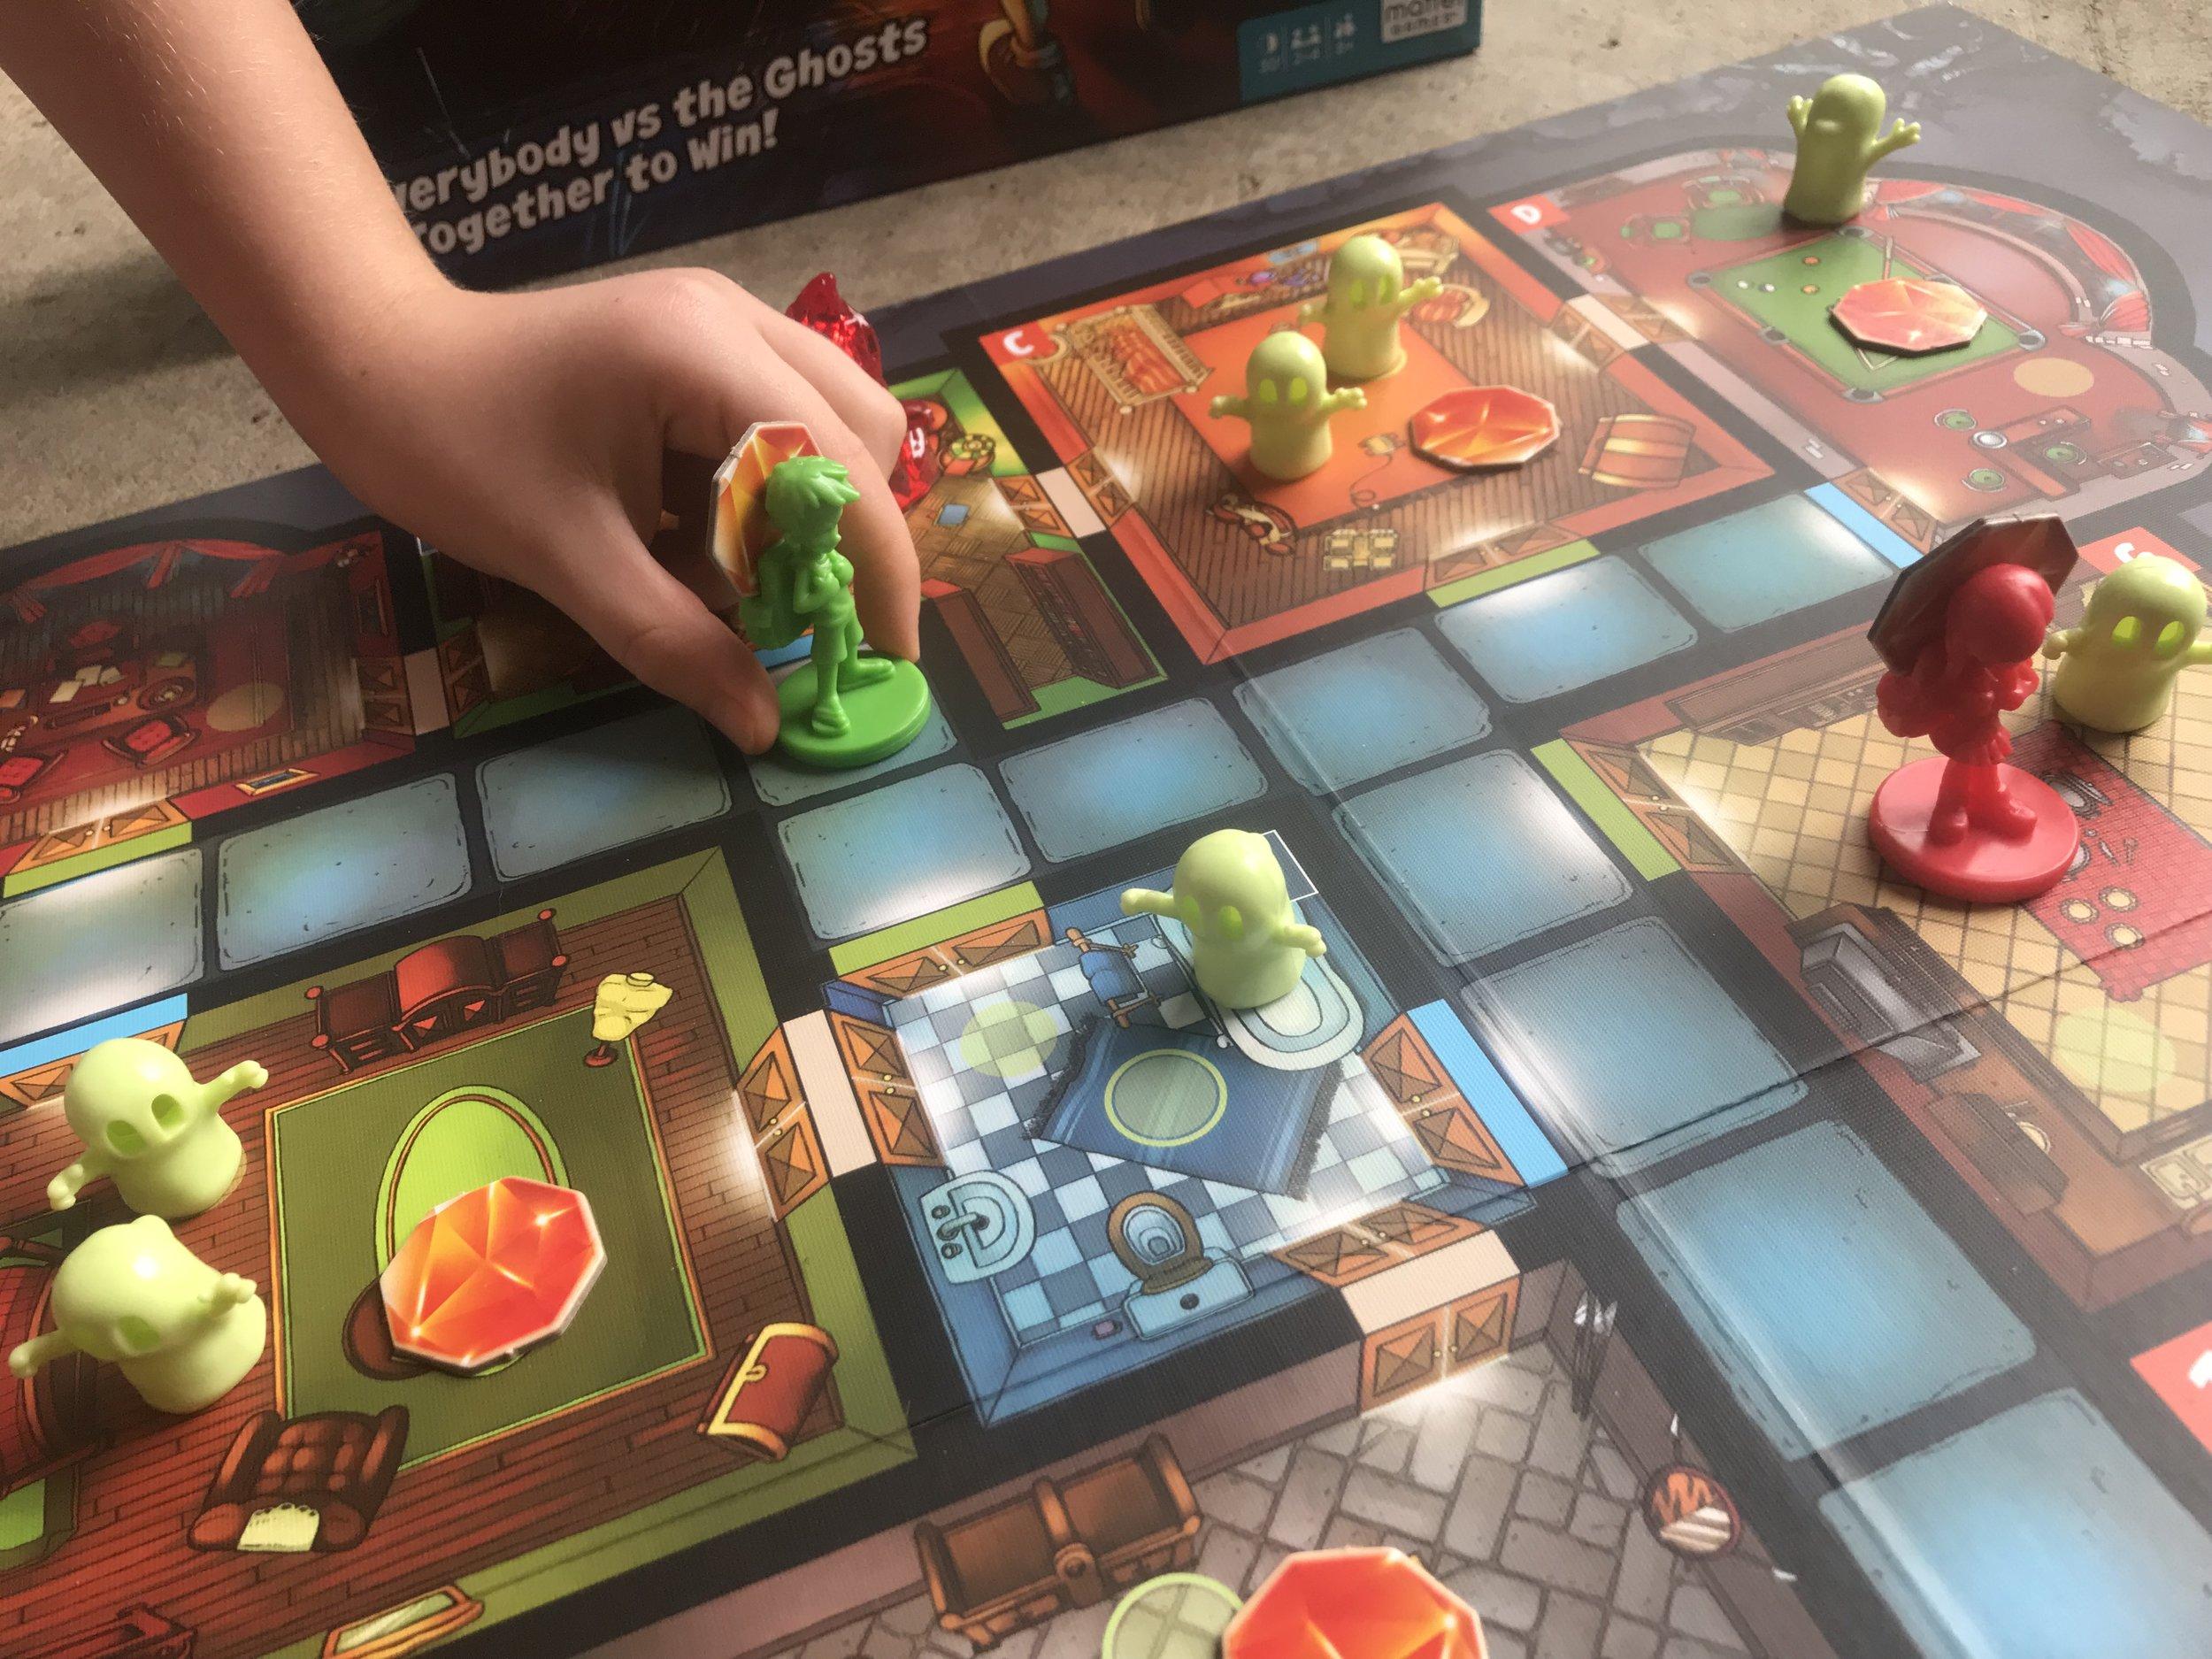 ghost fightin treasure hunters mattel cooperative game review 9.jpeg